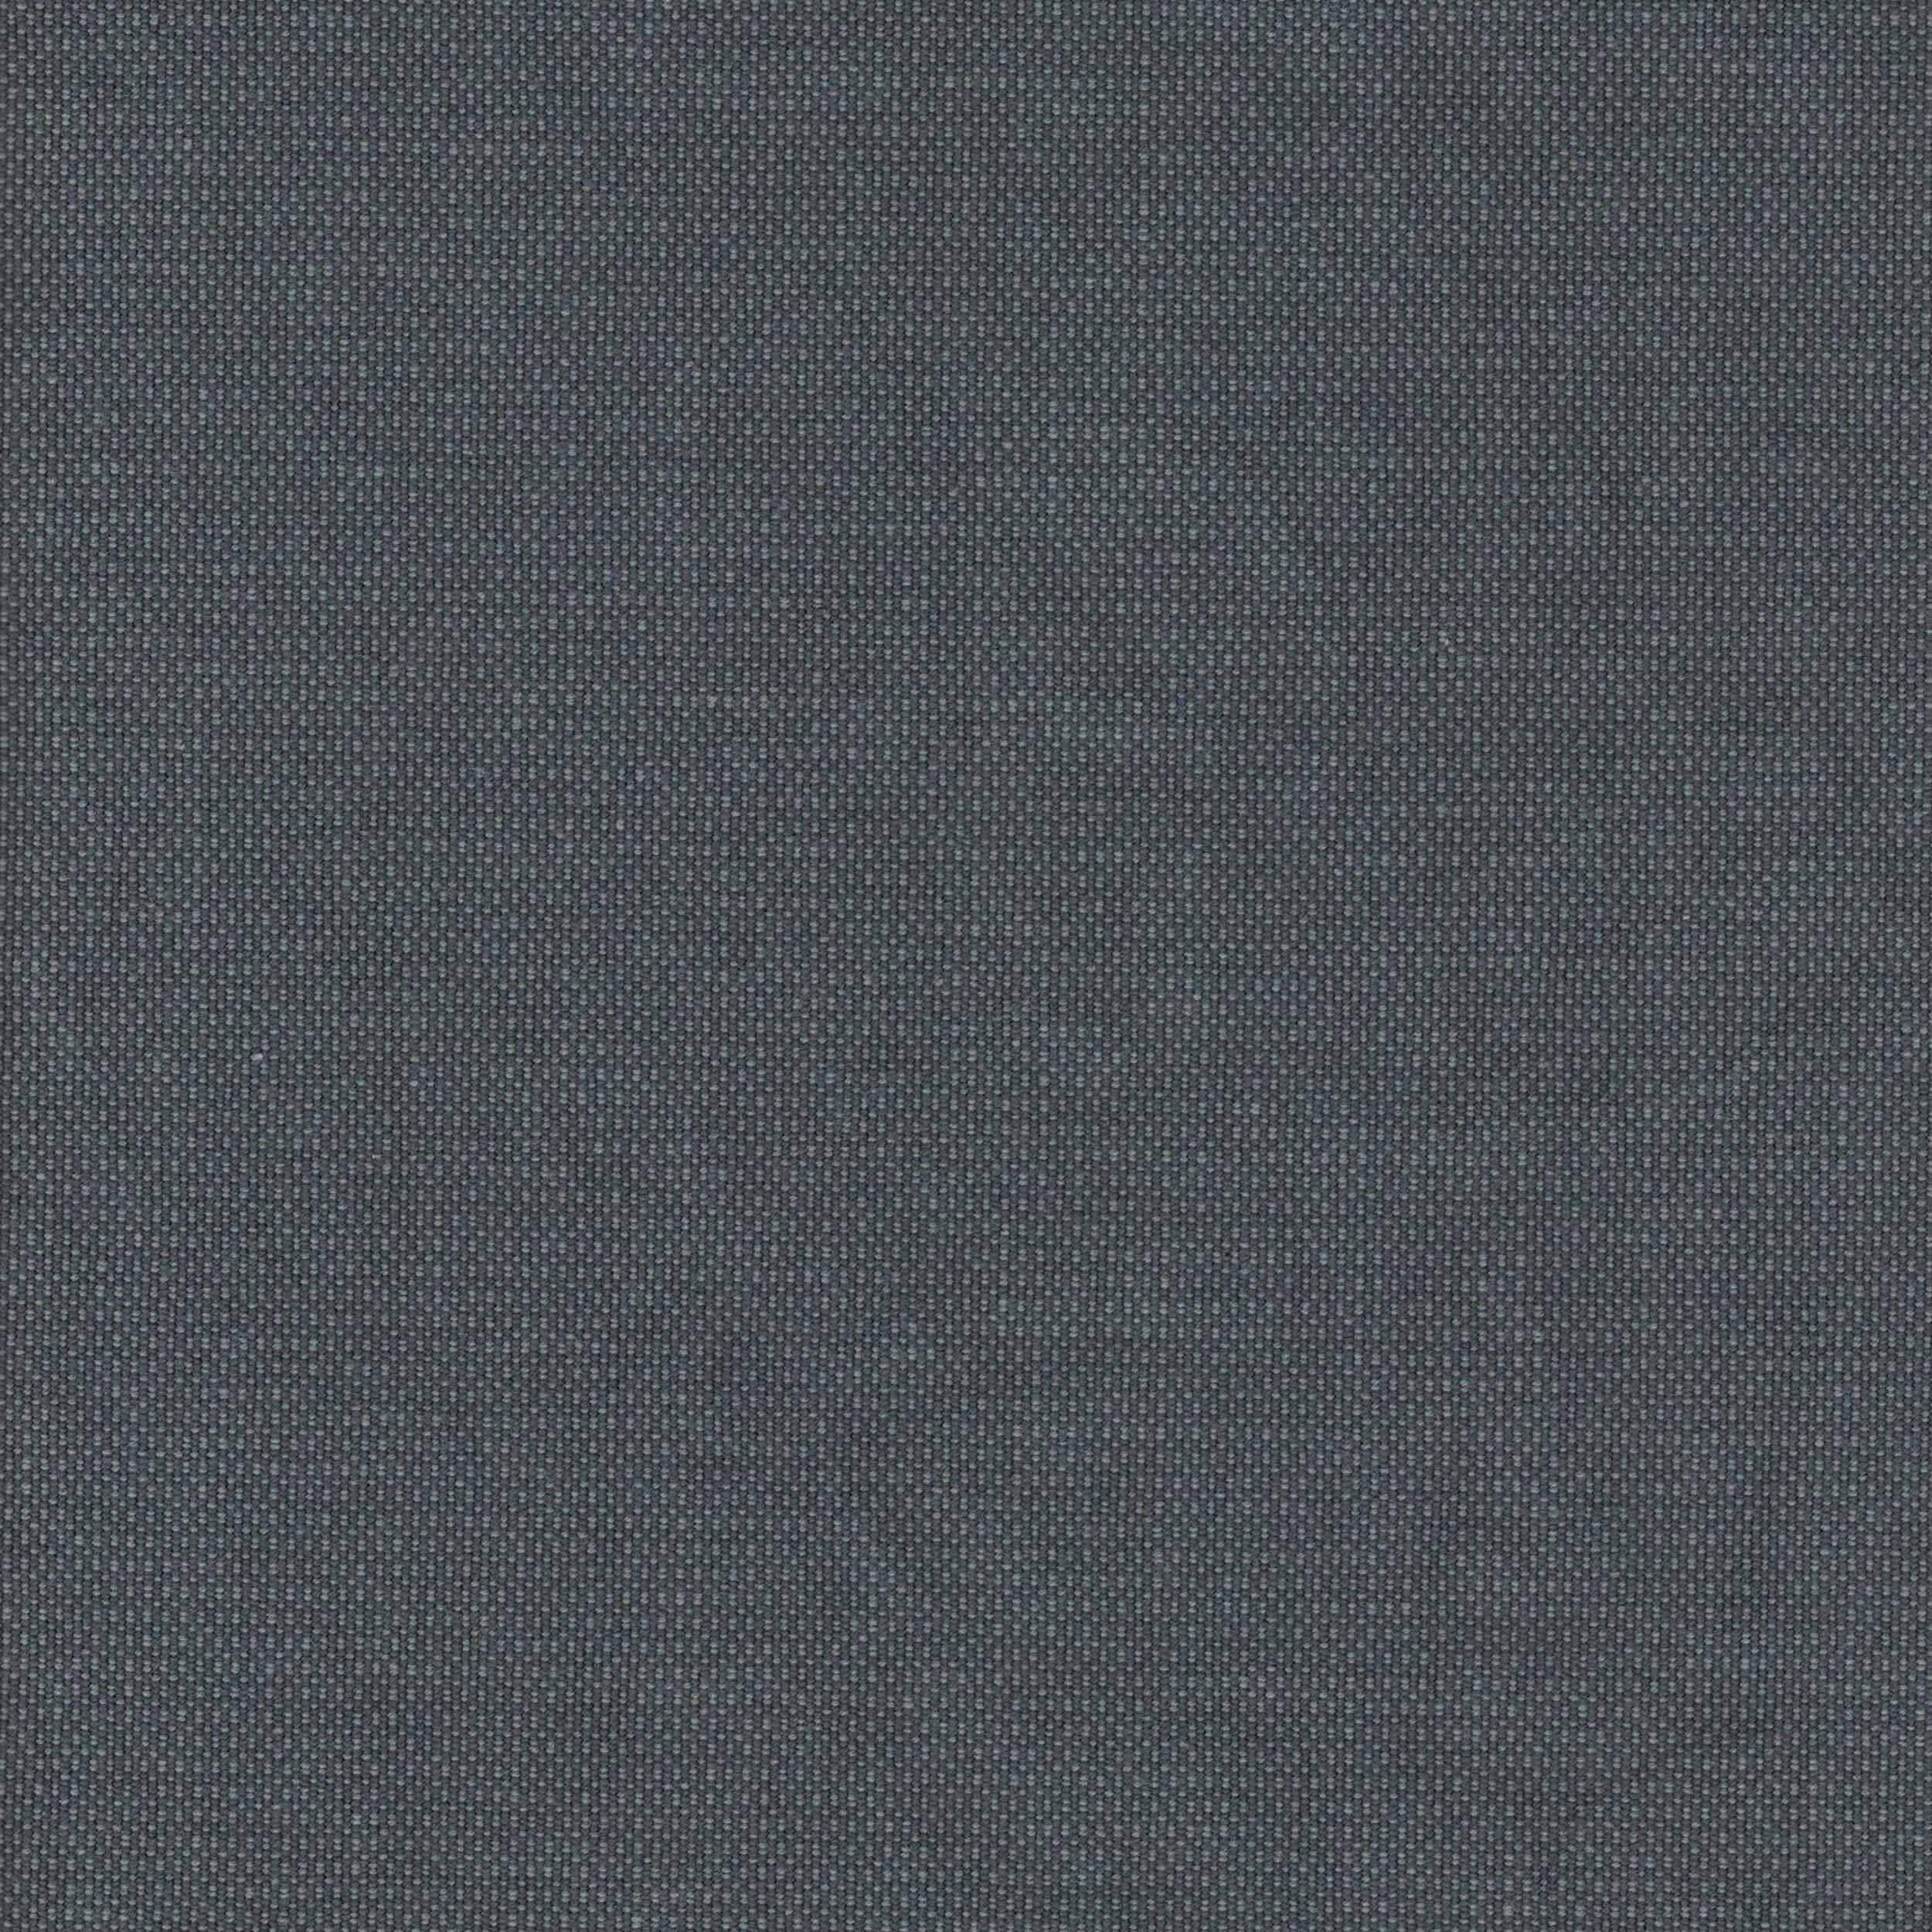 Andre Slipcover Sofa, Dyno White - Fabric - Sofas - Furniture regarding White Fabric Sofas (Image 5 of 30)